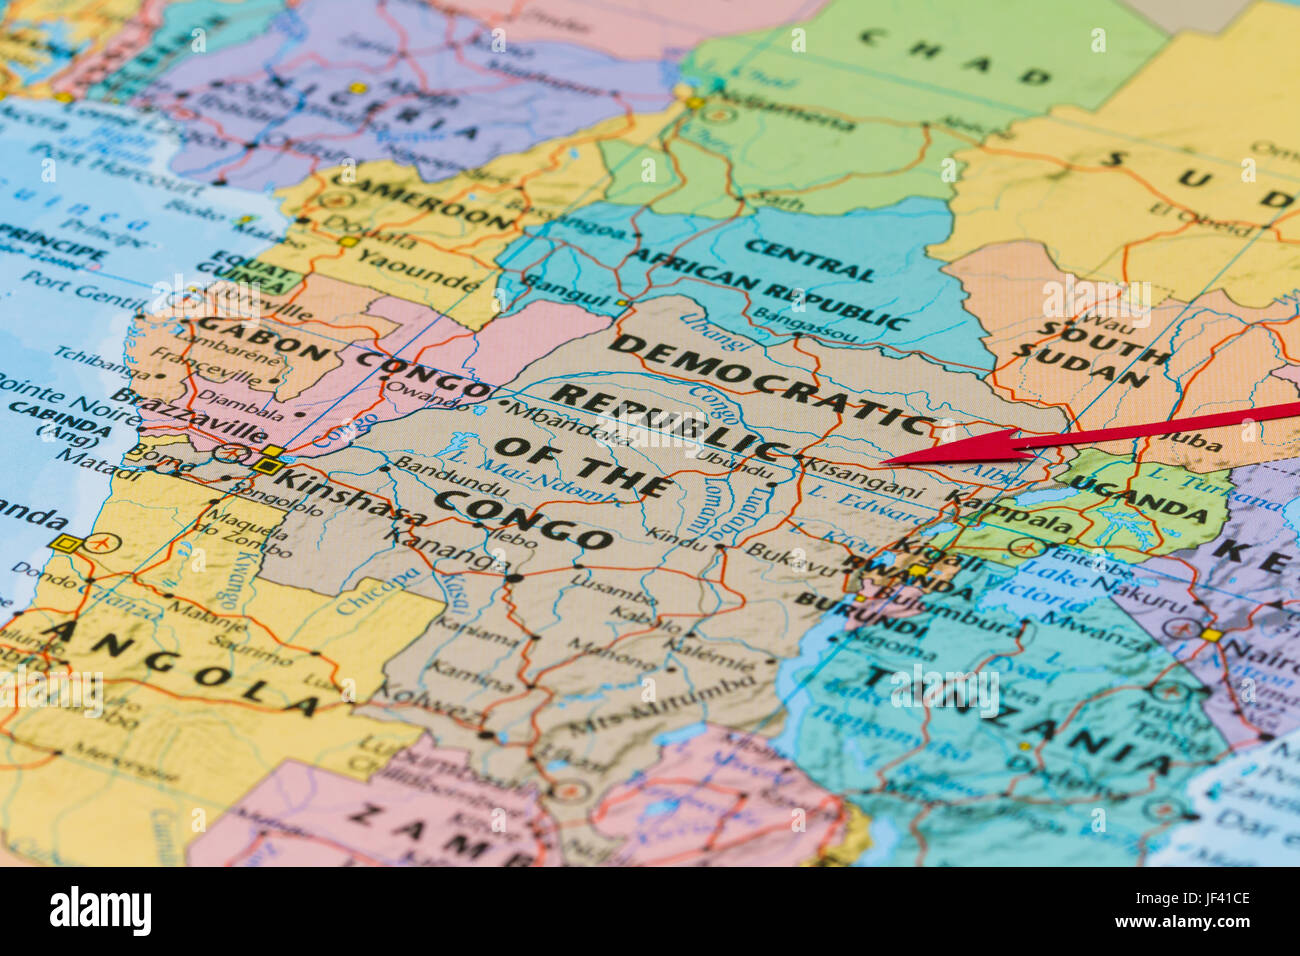 on democratic republic congo map